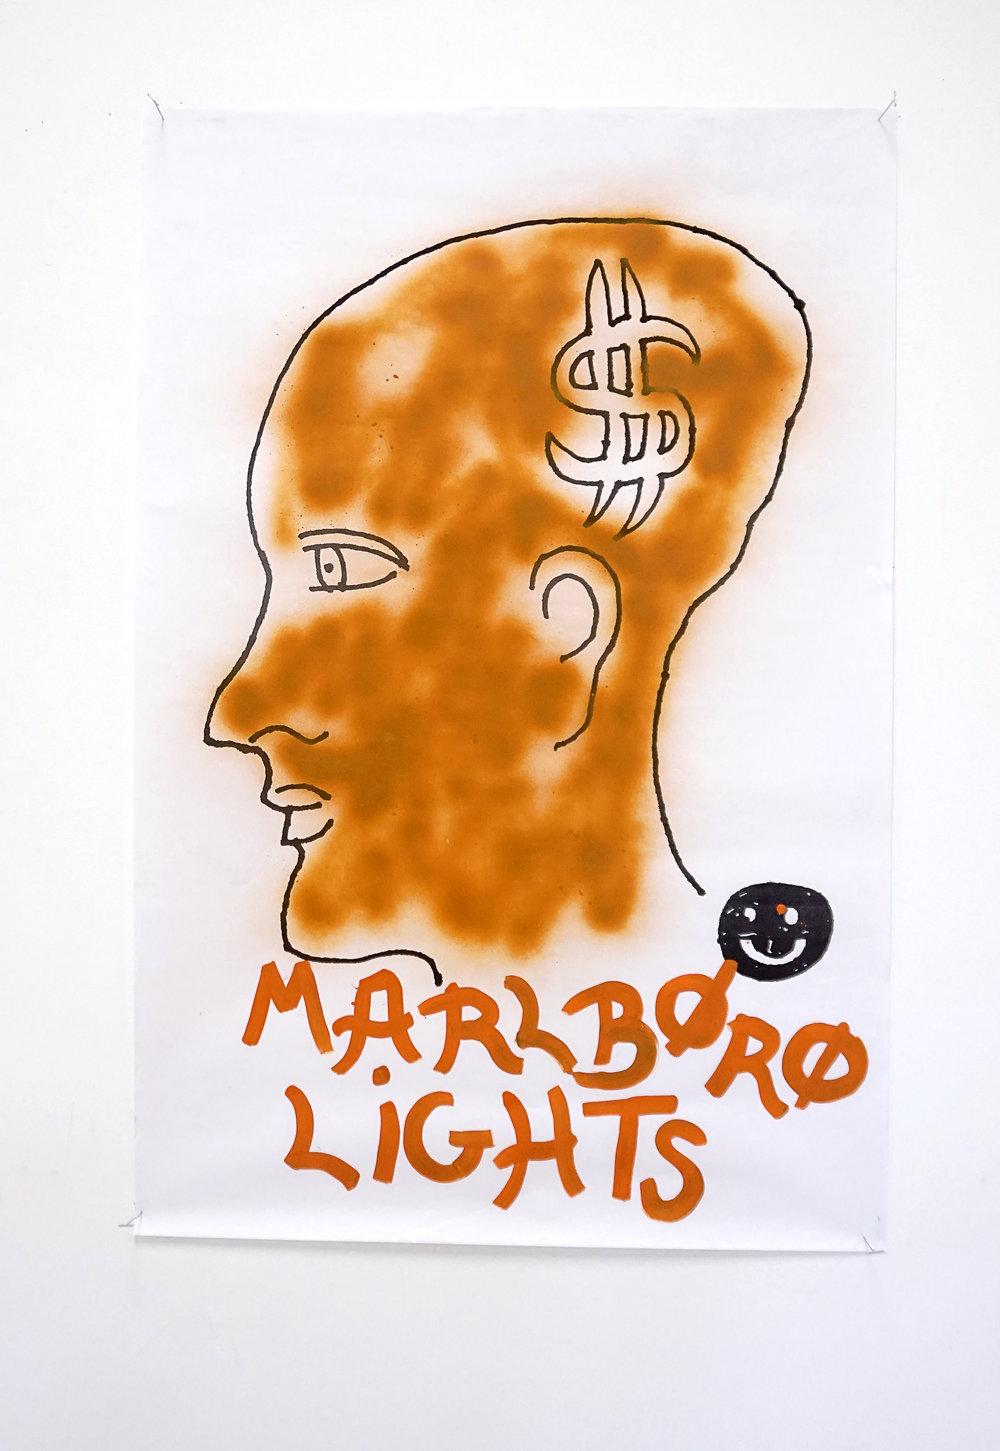 Marlboro Lights, 2017